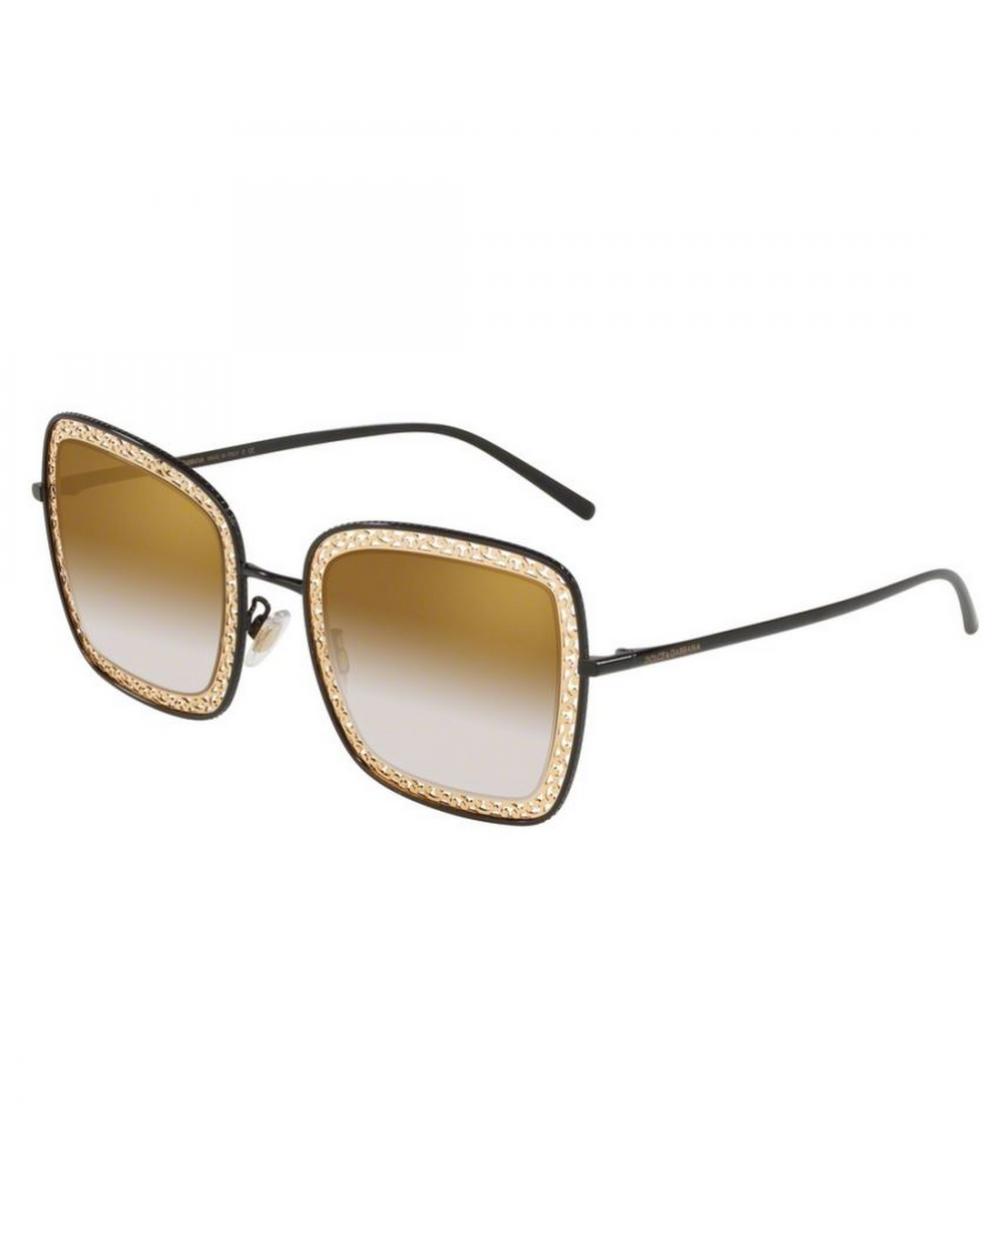 Sunglasses Dolce&gabbana DG 2225 original packaging warranty italy